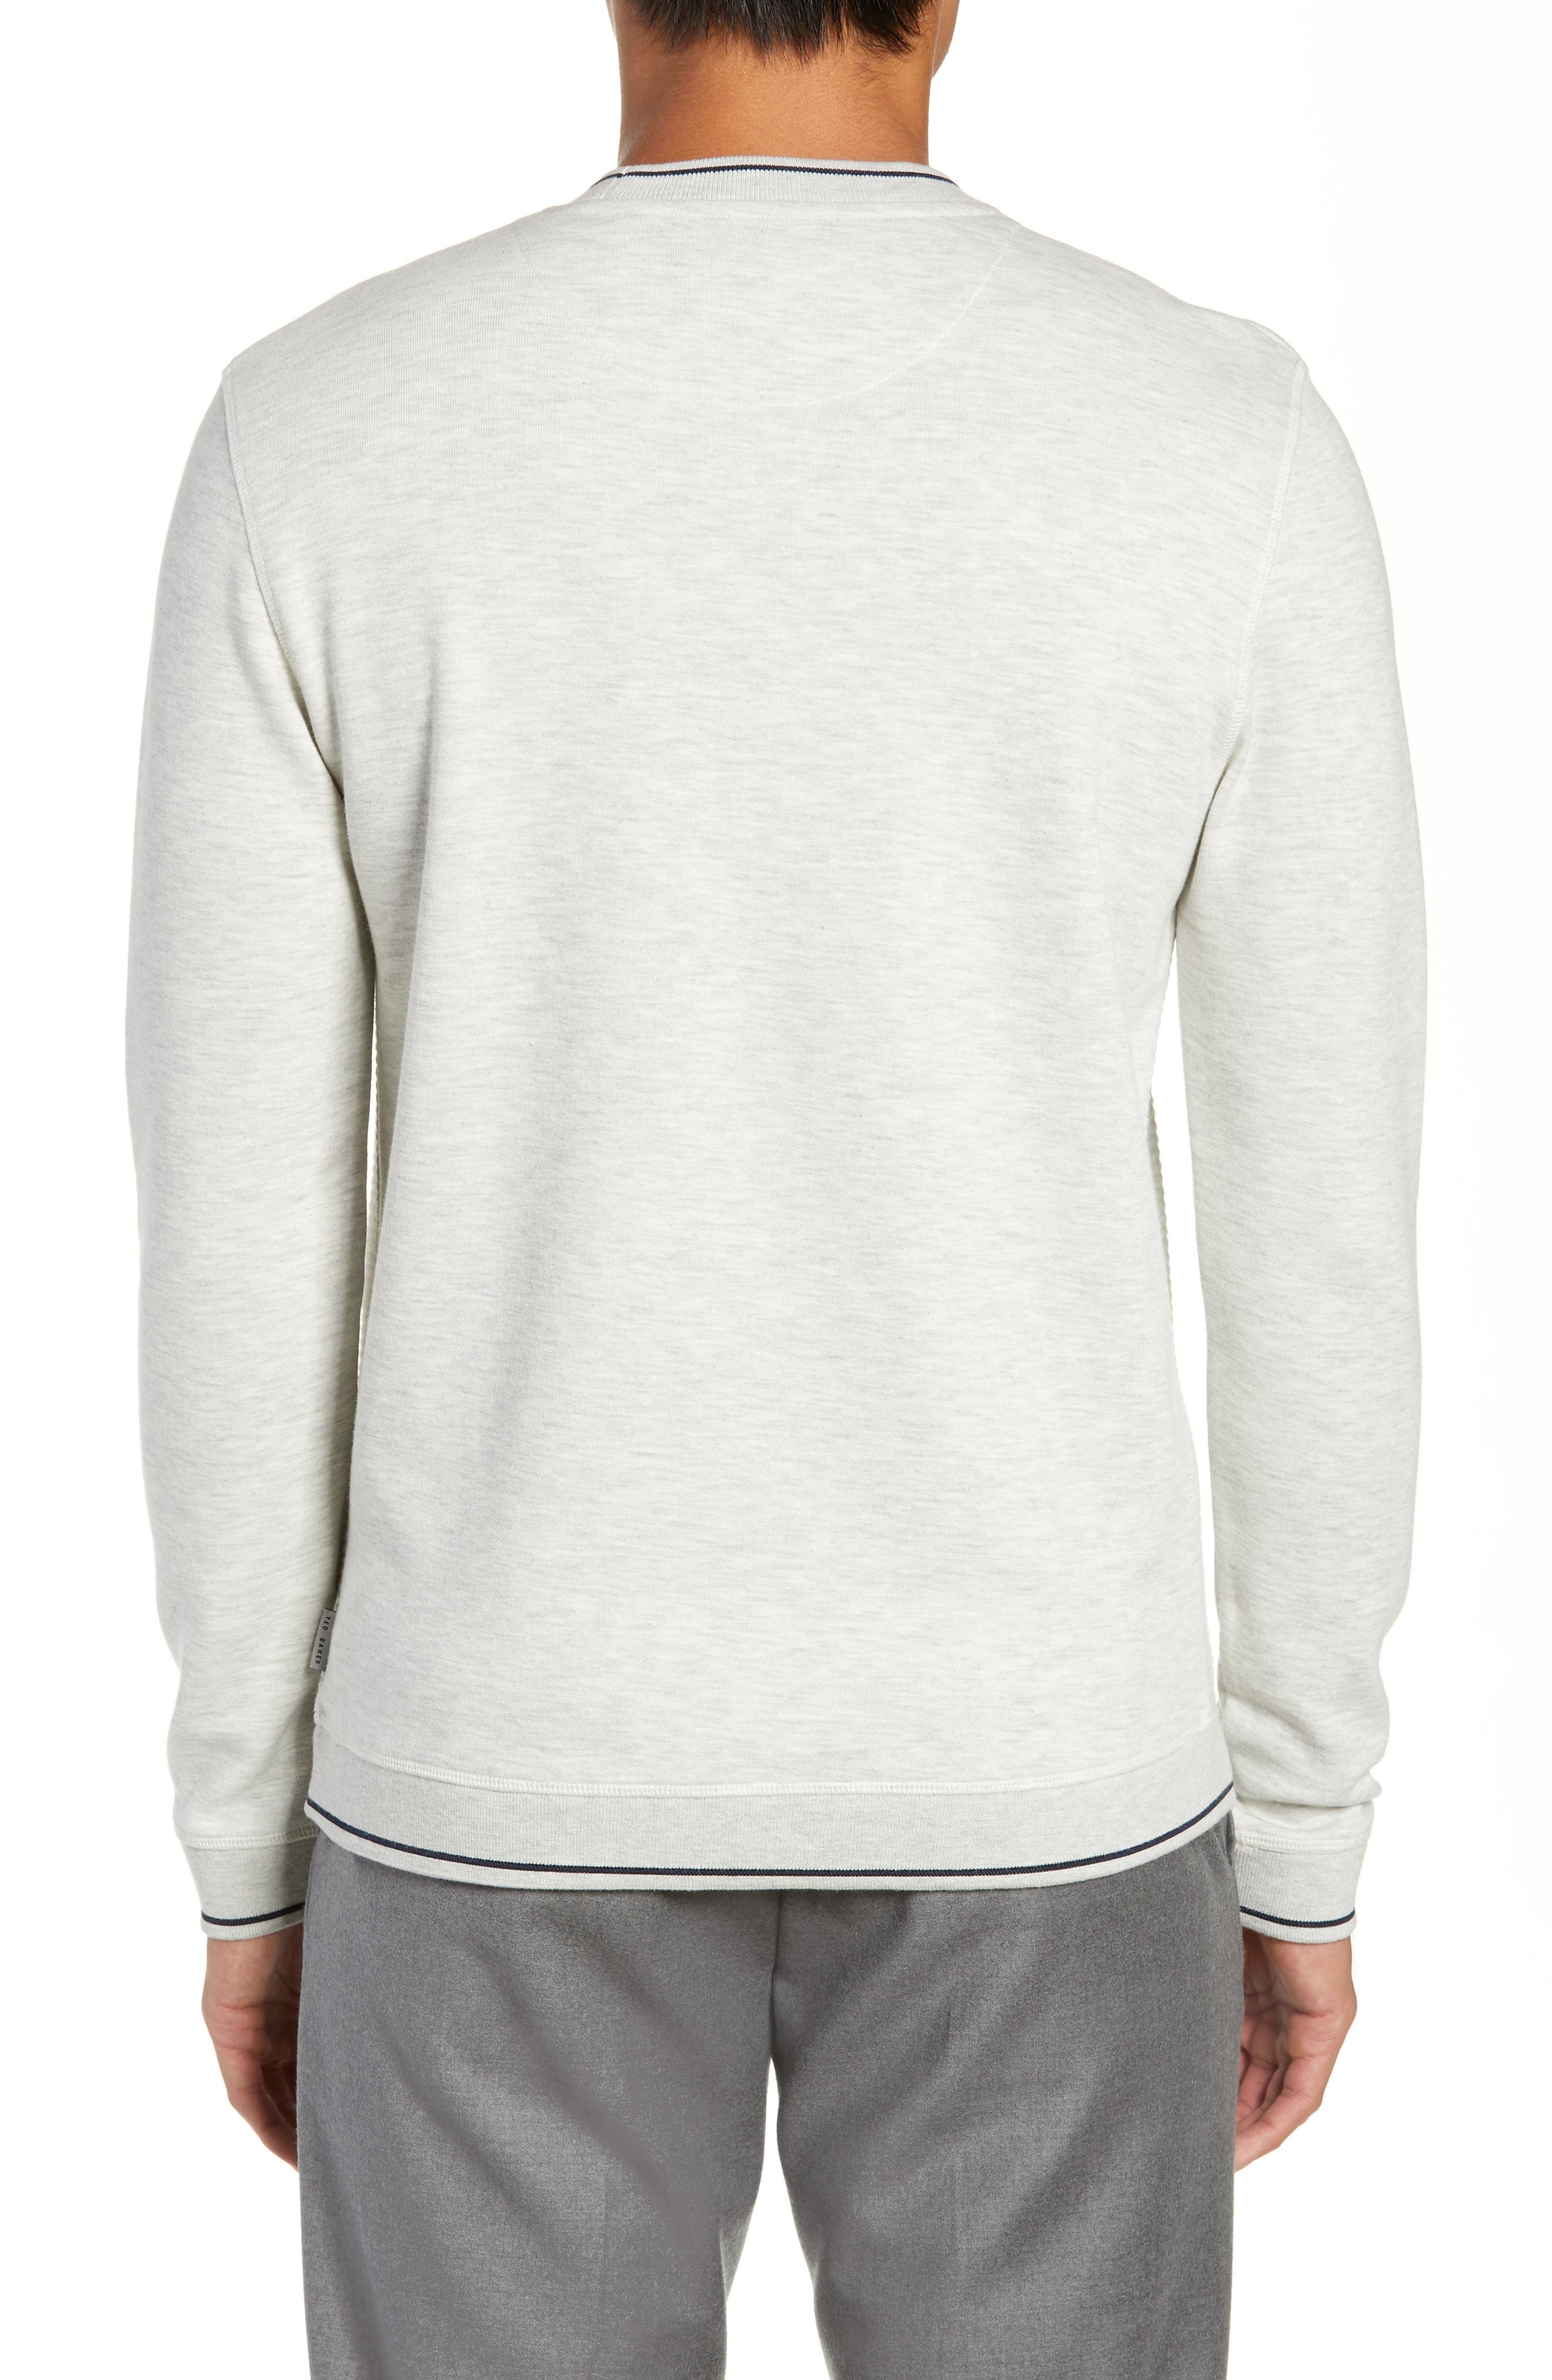 Magiics Slim Fit Quilted Sweatshirt,                             Alternate thumbnail 2, color,                             LIGHT GREY